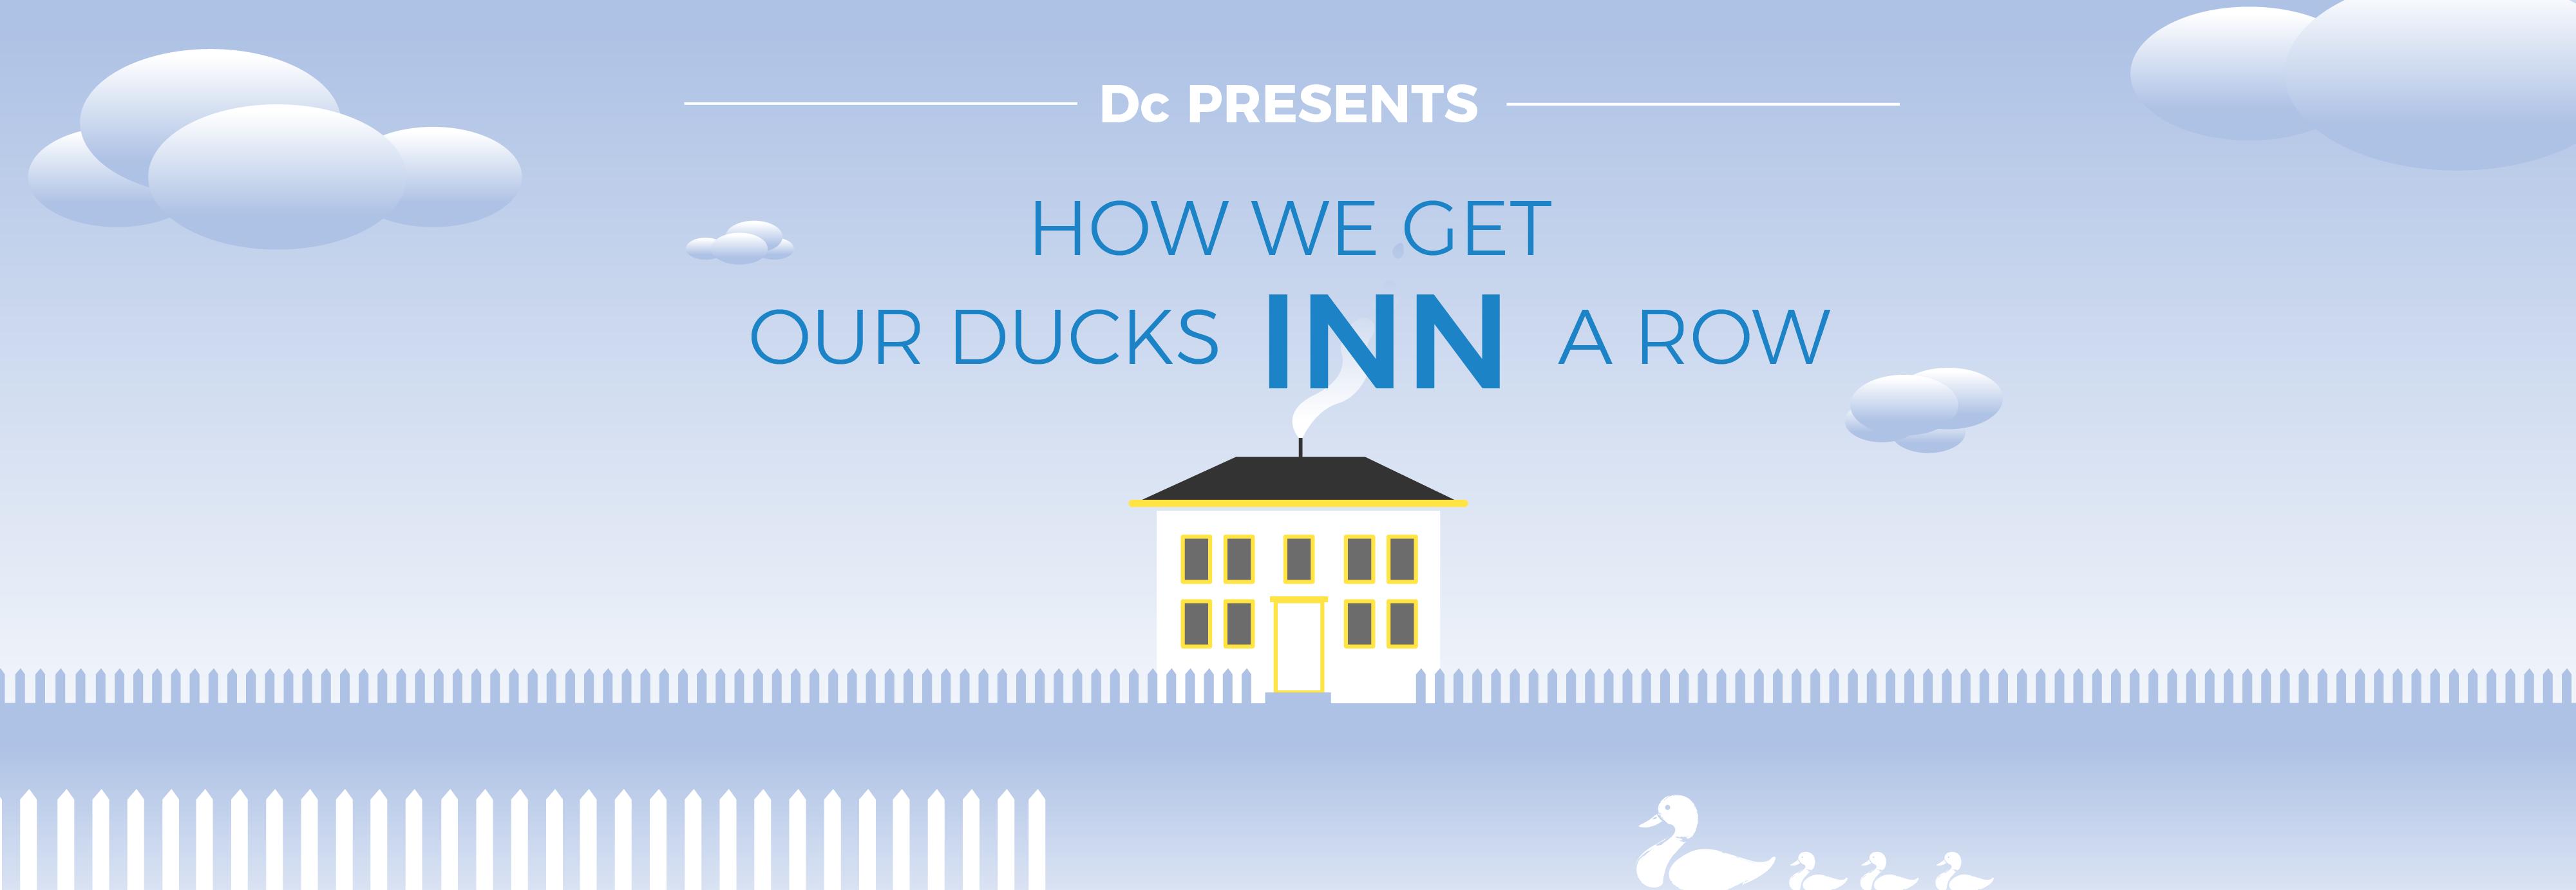 Dc Presents: How We Get Our Ducks Inn a Row